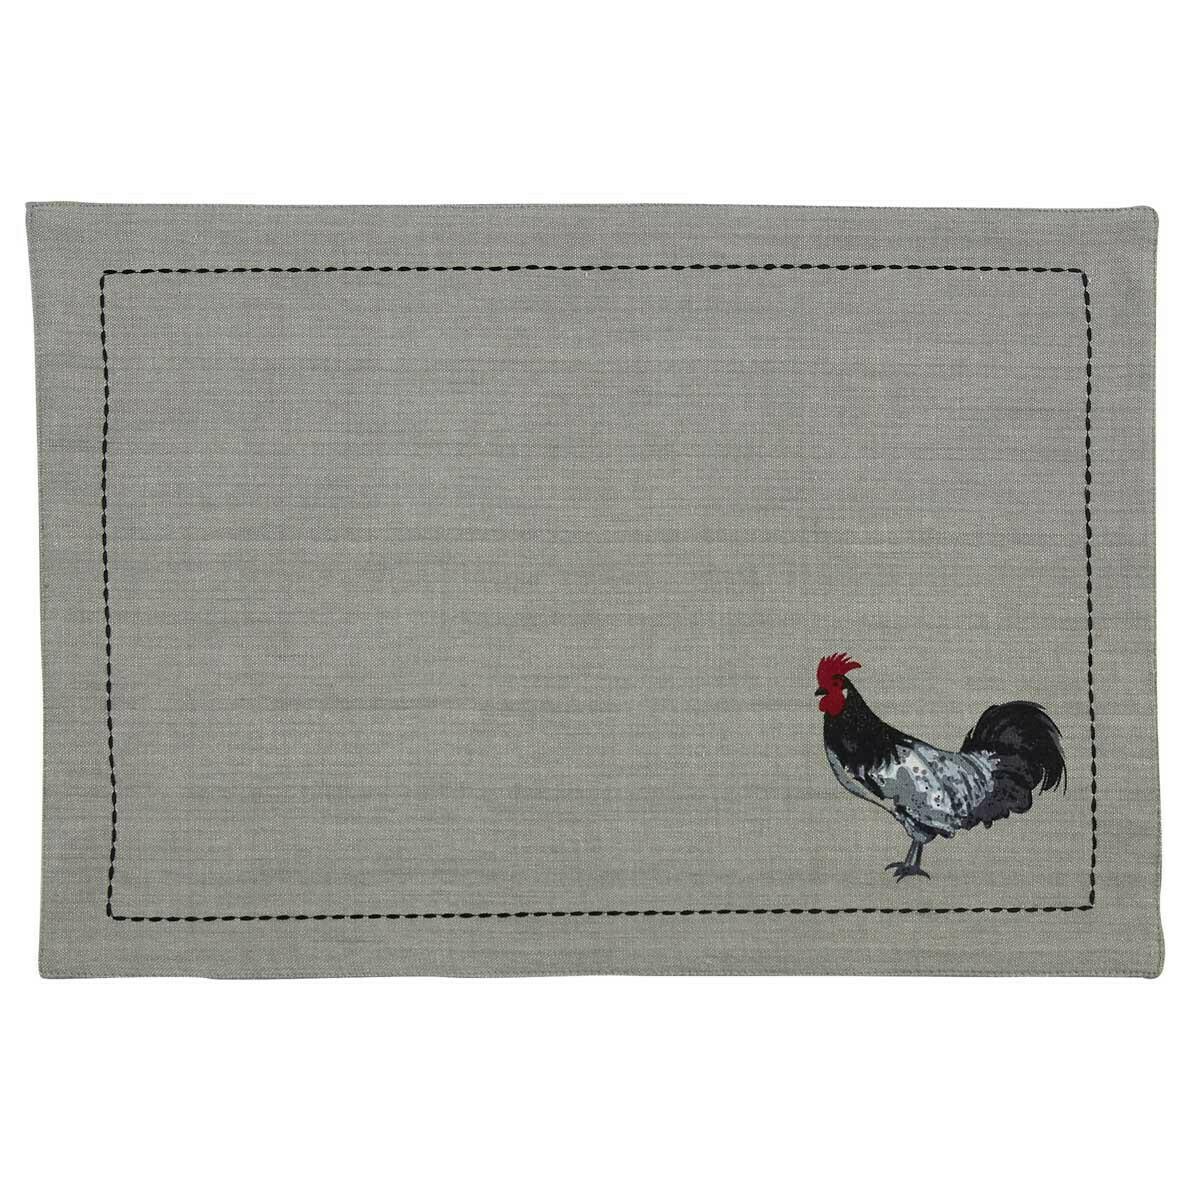 Chicken Coop Placemat